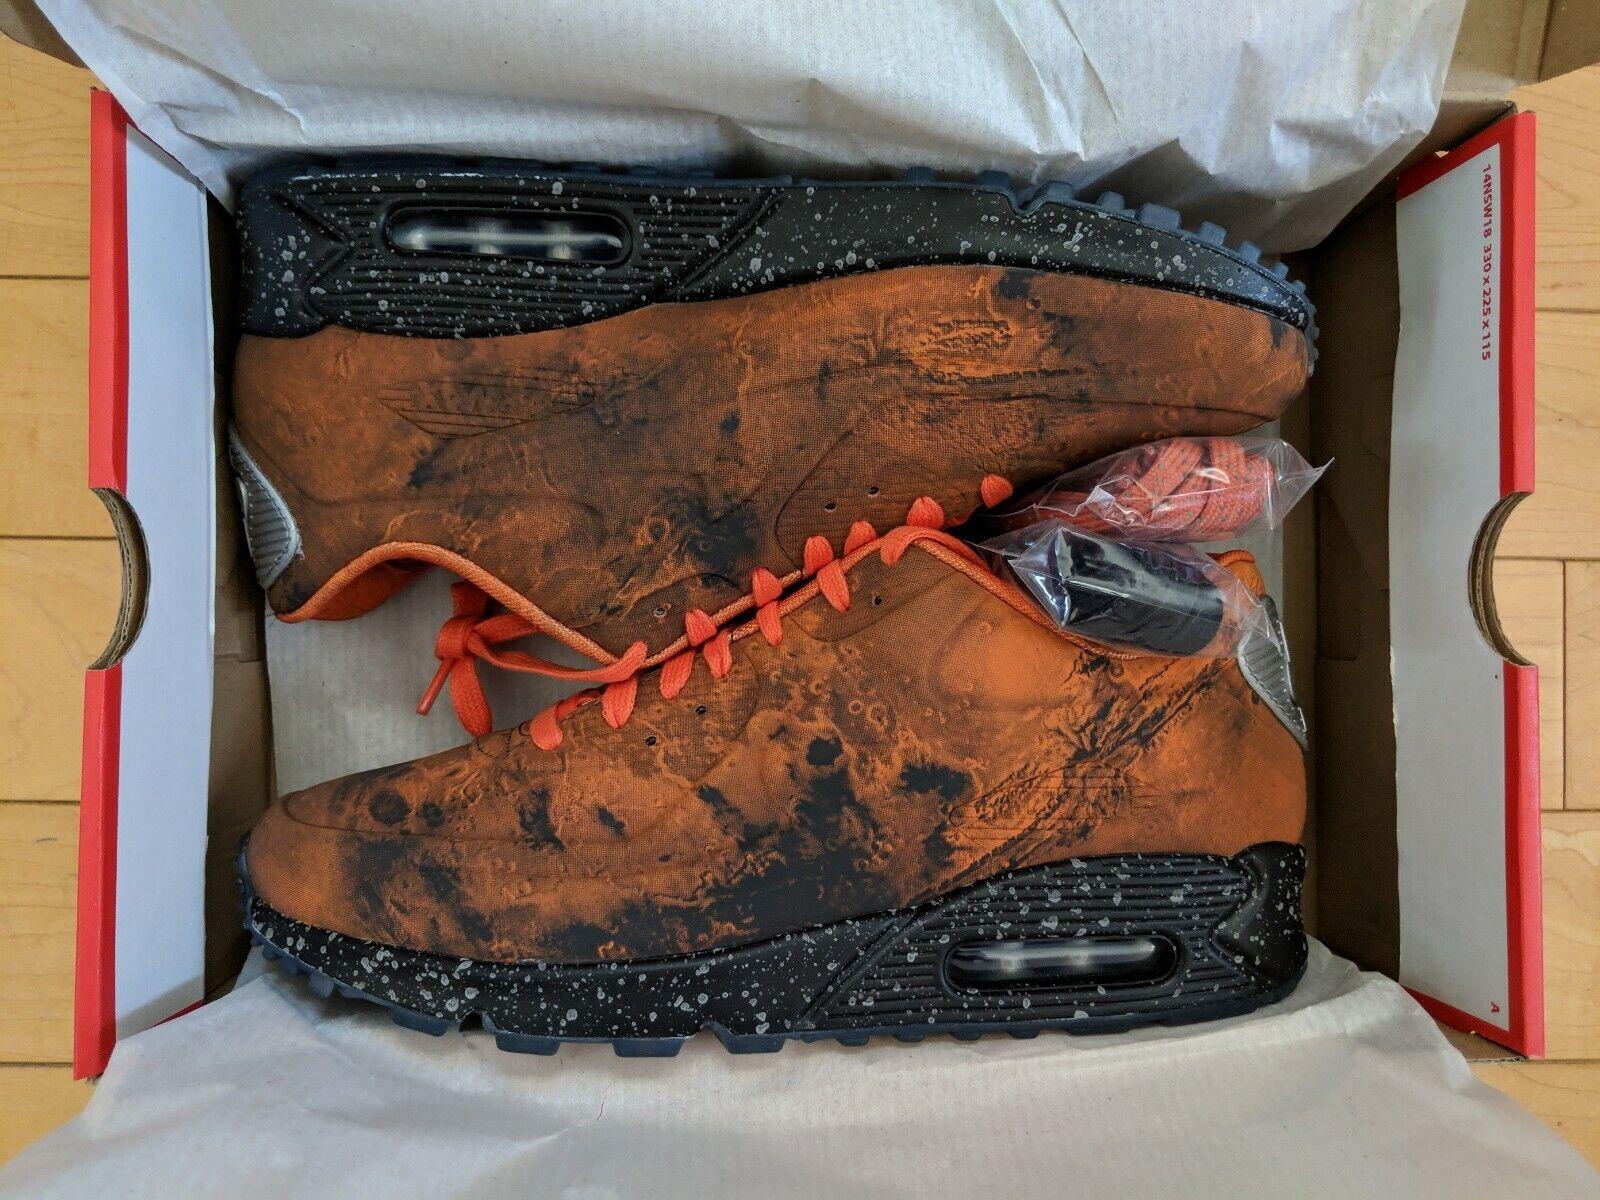 57d8a23bca4 Nike Air 90 Mars Landing - Size 10 - orange 3M Reflective - NEW Sneaker Max  nomwoe5435-Athletic Shoes